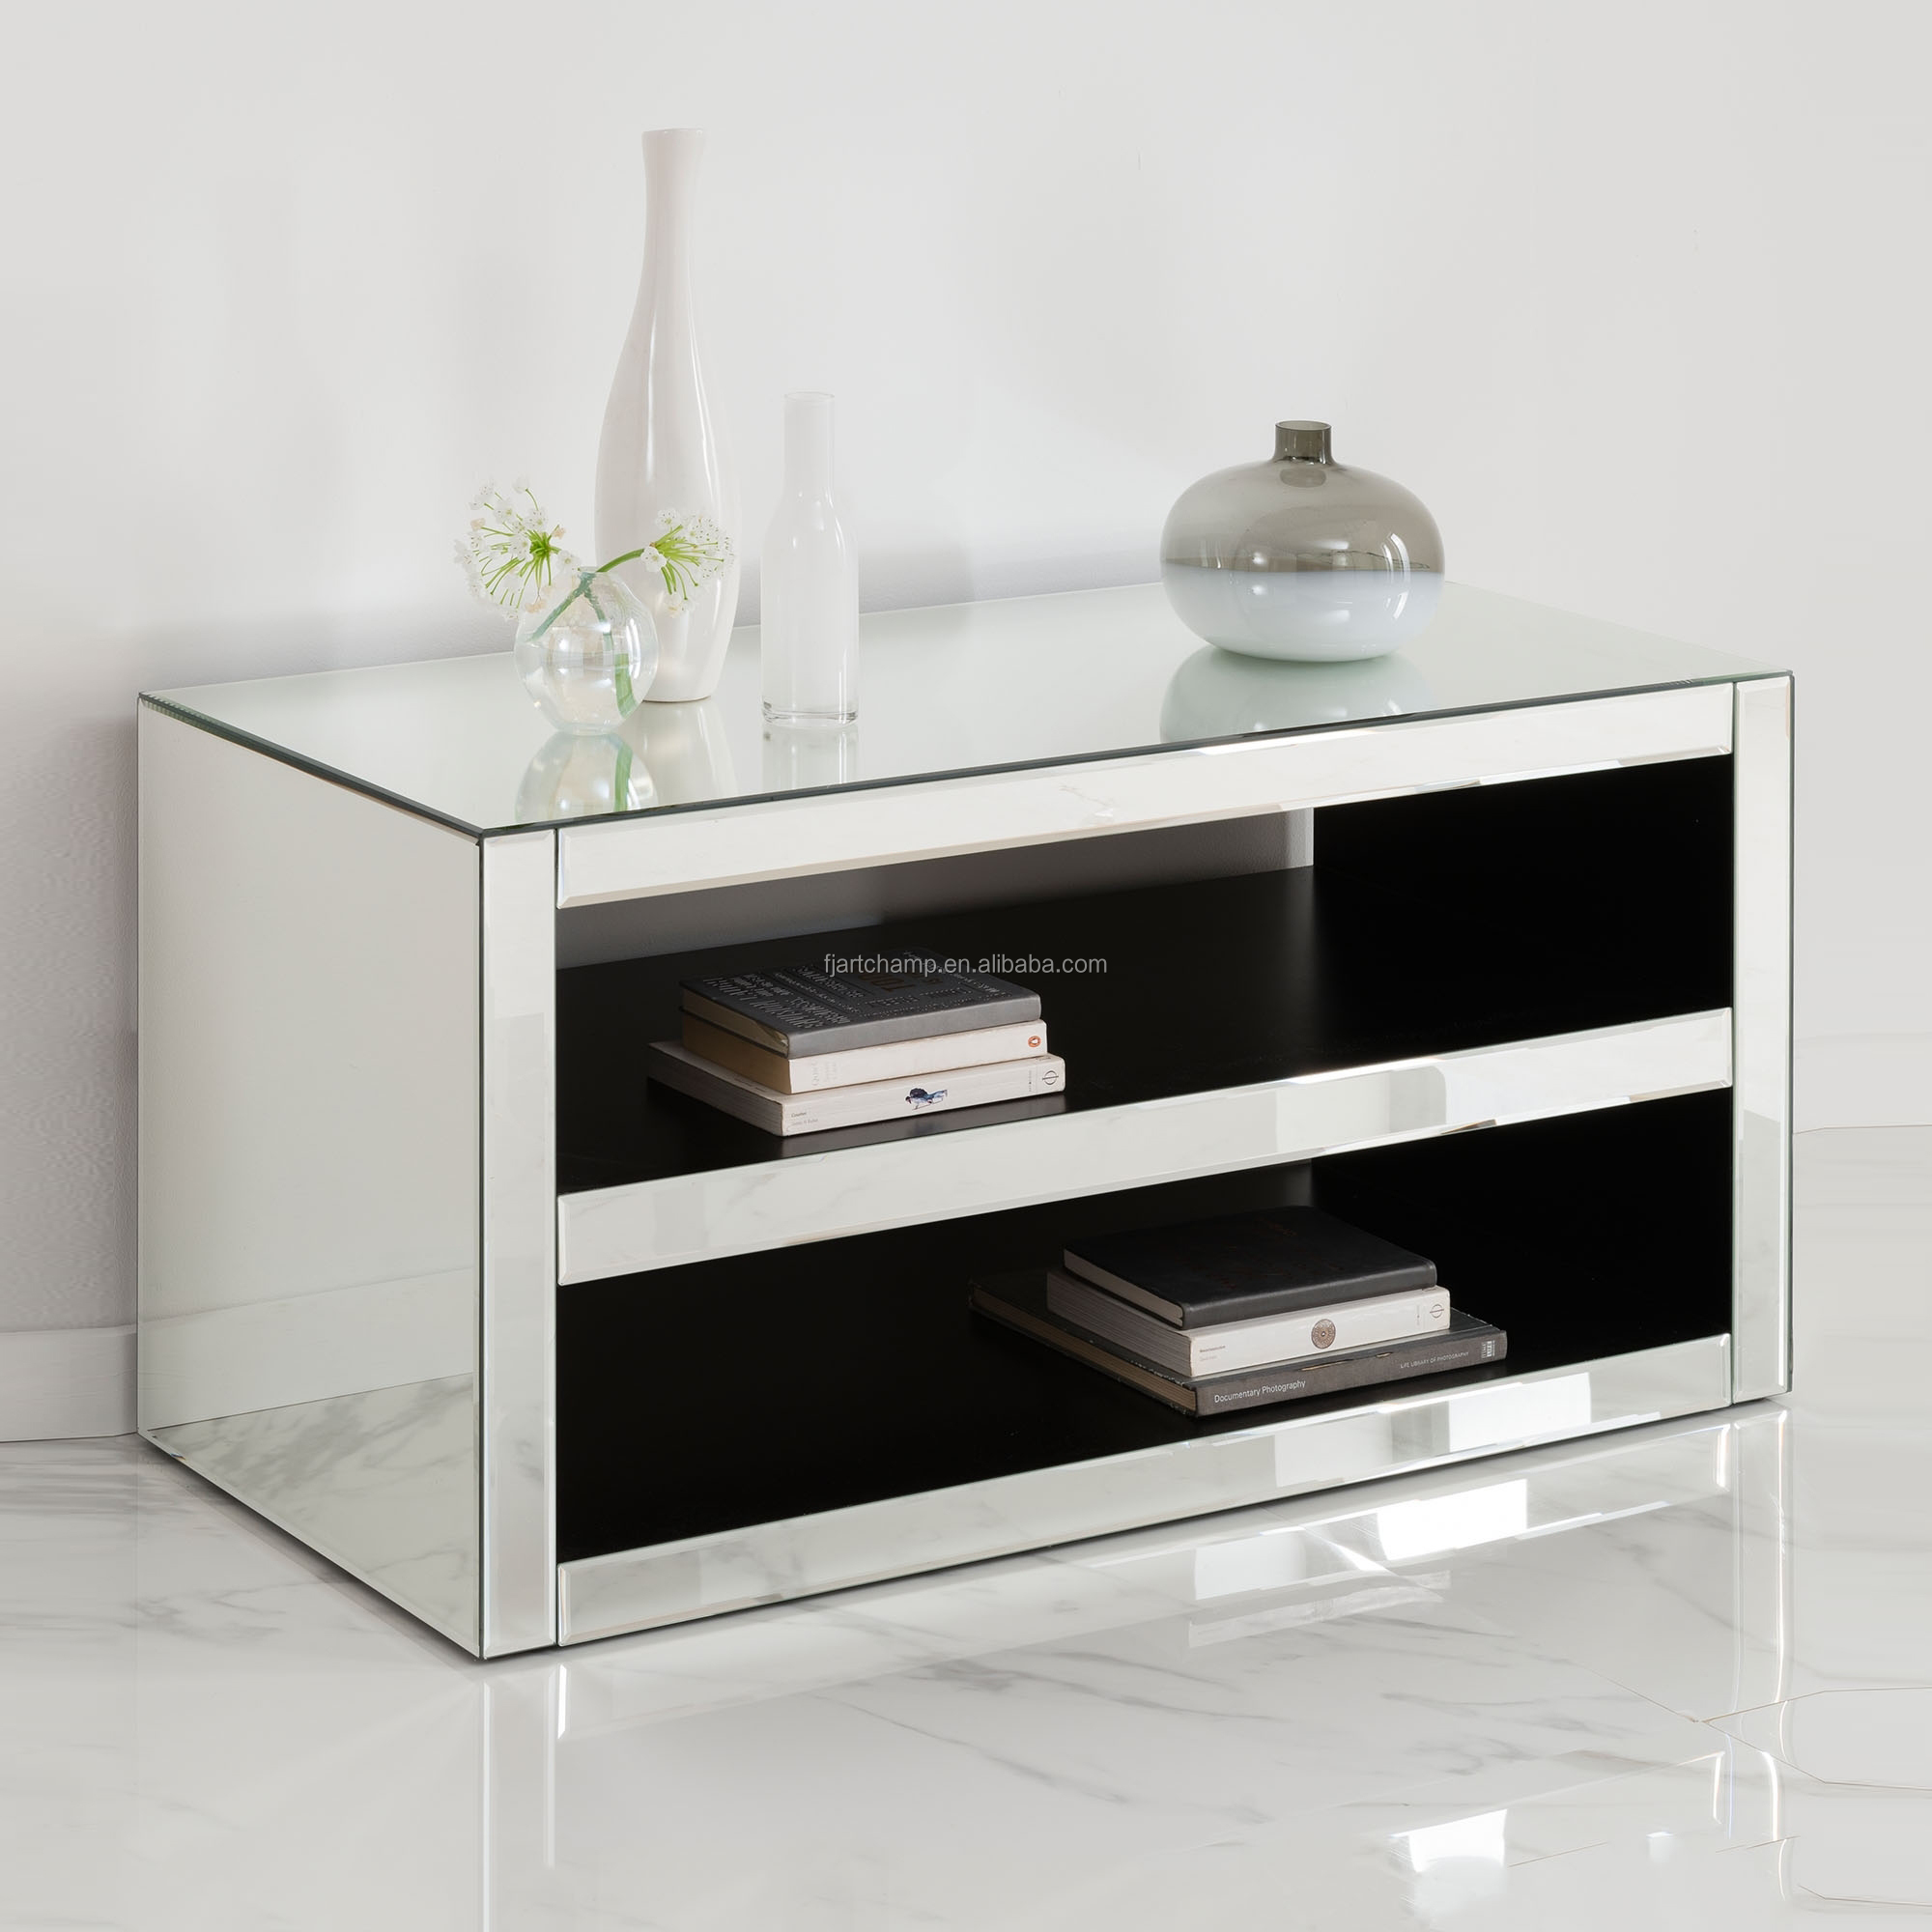 Kayu Solid Dalam Ruangan Cermin Sudut Meja Kaca Tv Modern Buy Meja Televisi Product On Alibaba Com